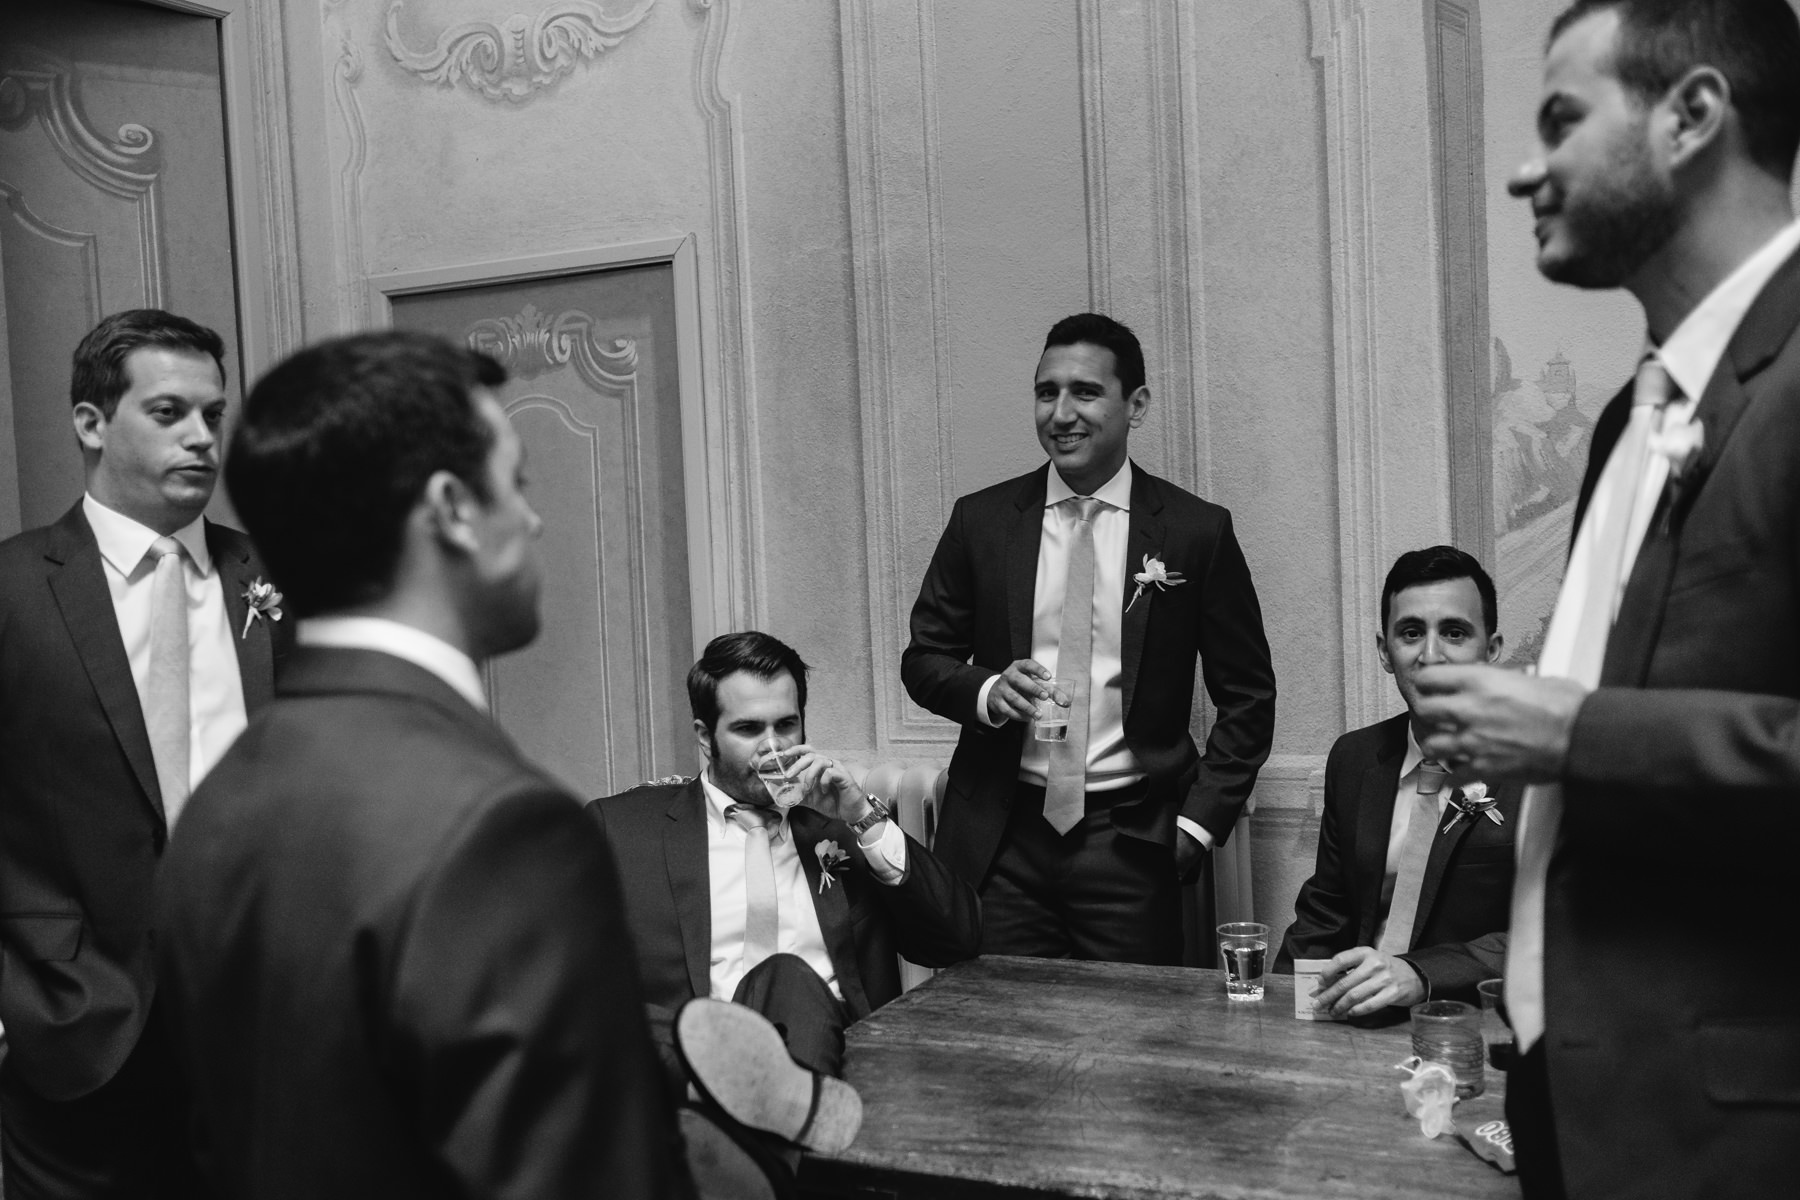 groom and groomsmen before the wedding at la foce